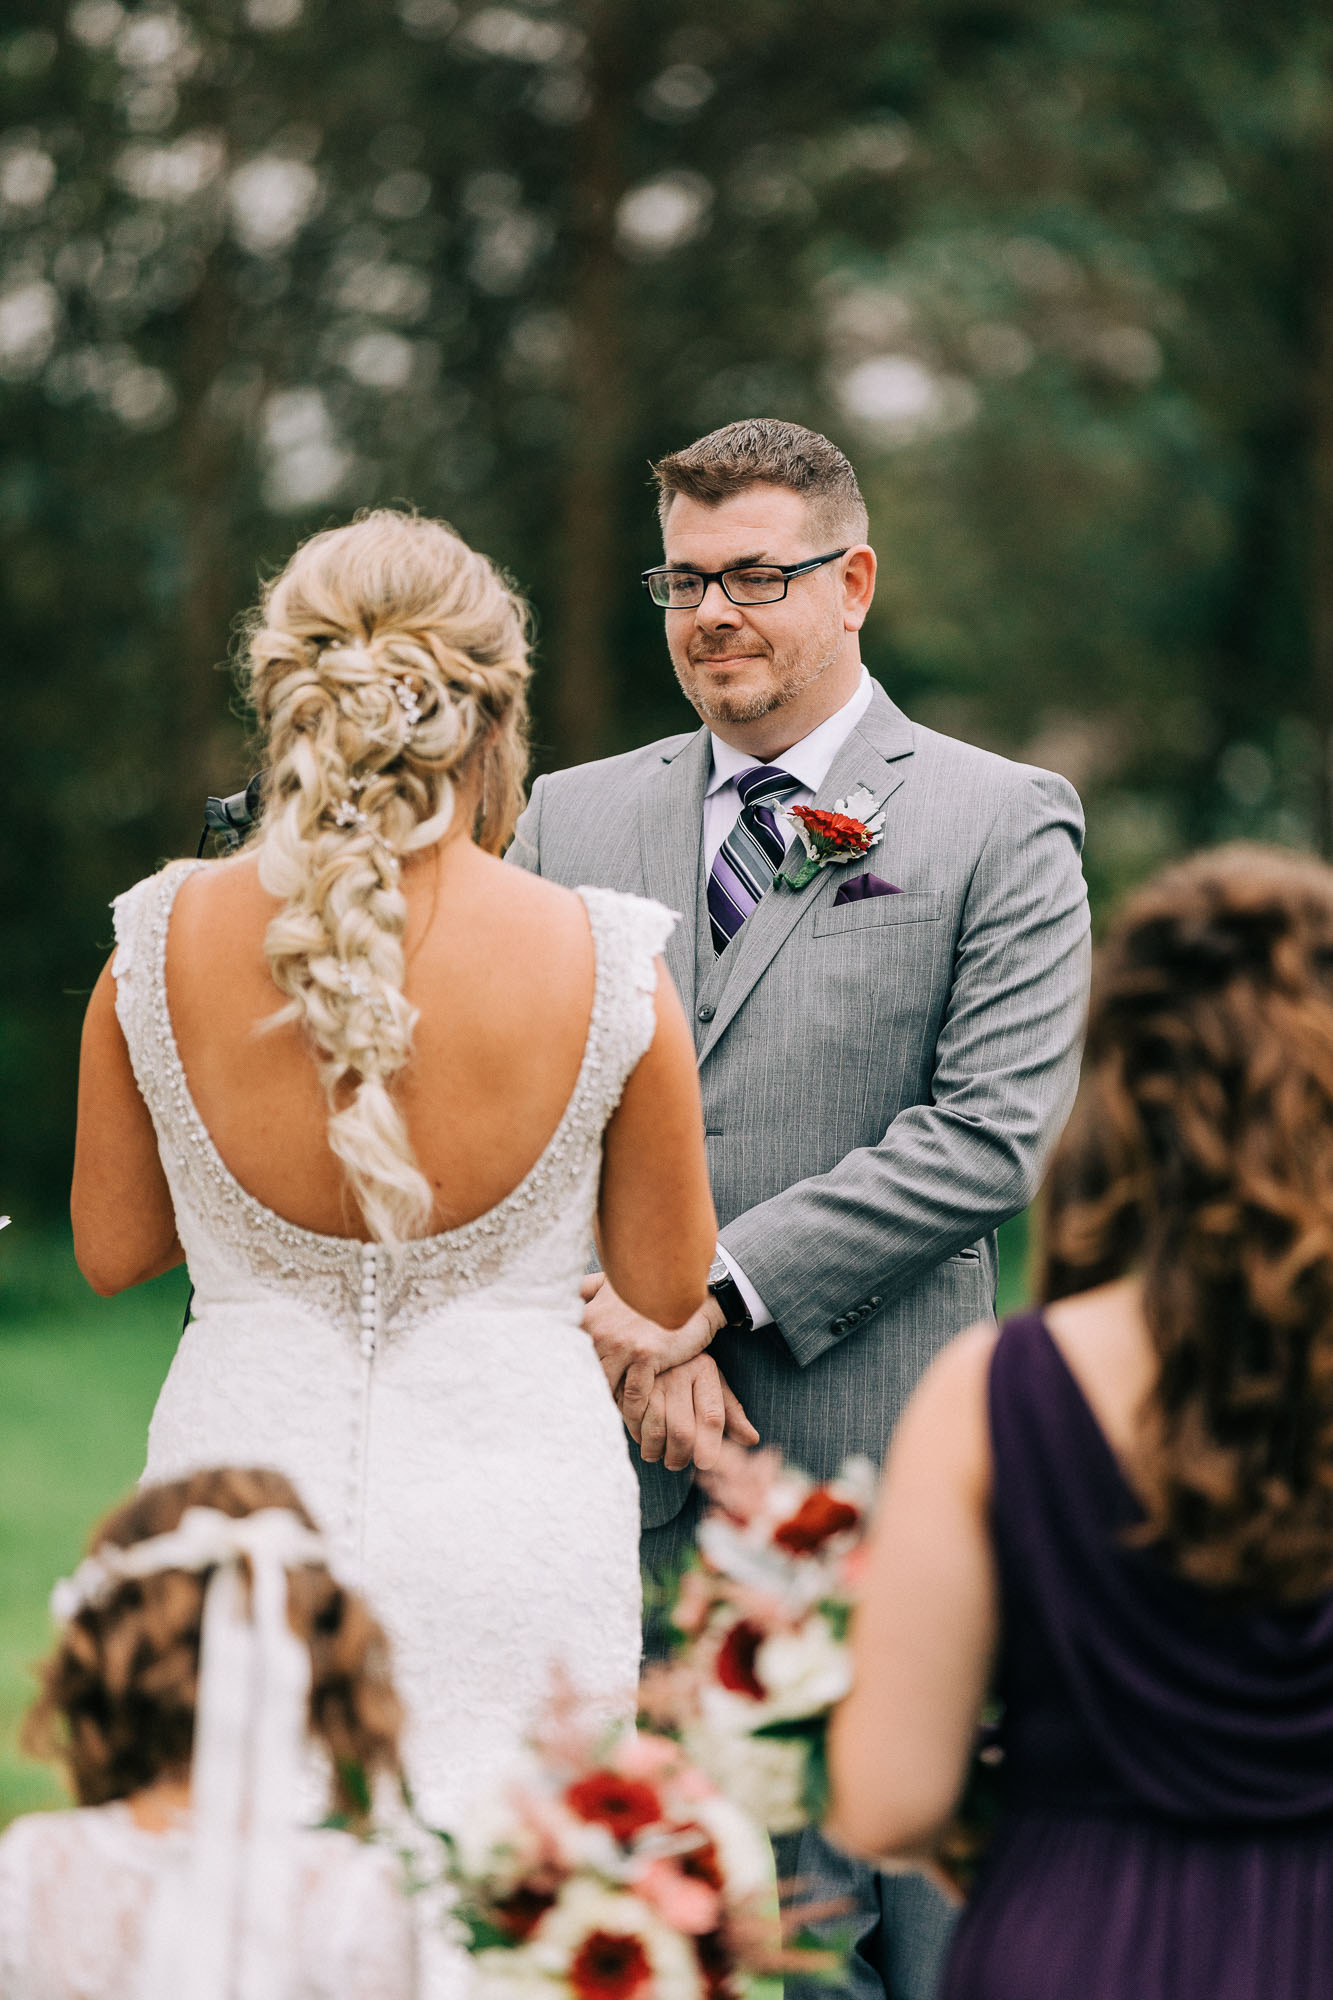 Lodge-at-Raven-Creek-October-wedding-30.jpg